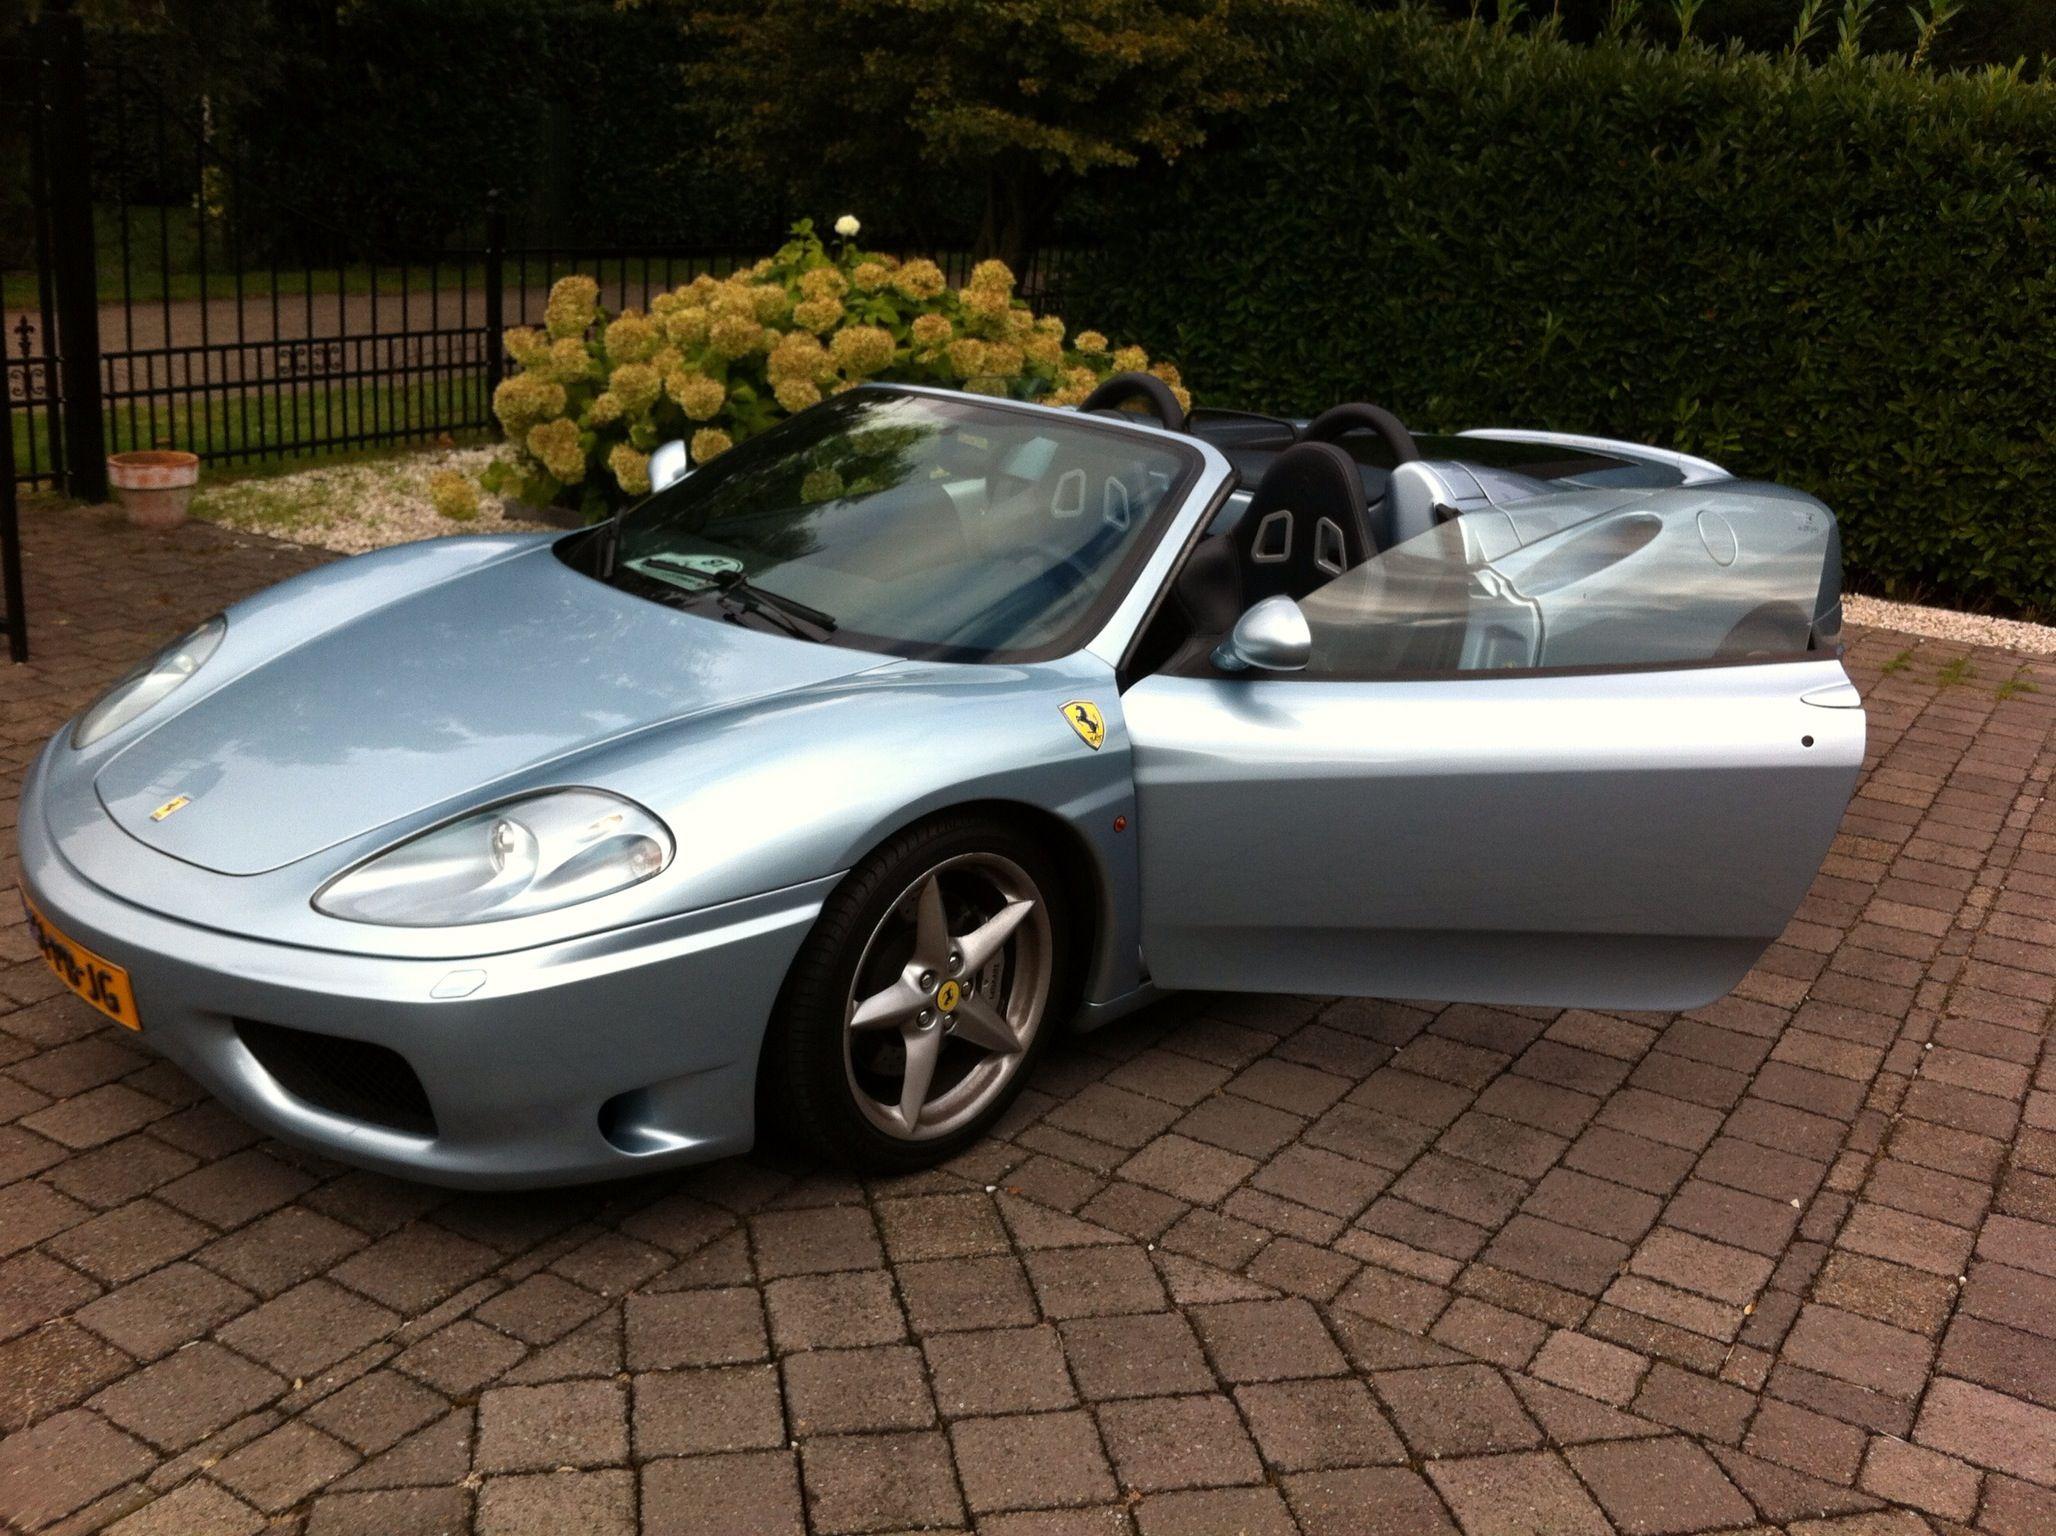 95ababb5b54ee2aab0ab946884363d94 Astounding Bugatti Veyron Grand Sport Vitesse Geschwindigkeit Cars Trend